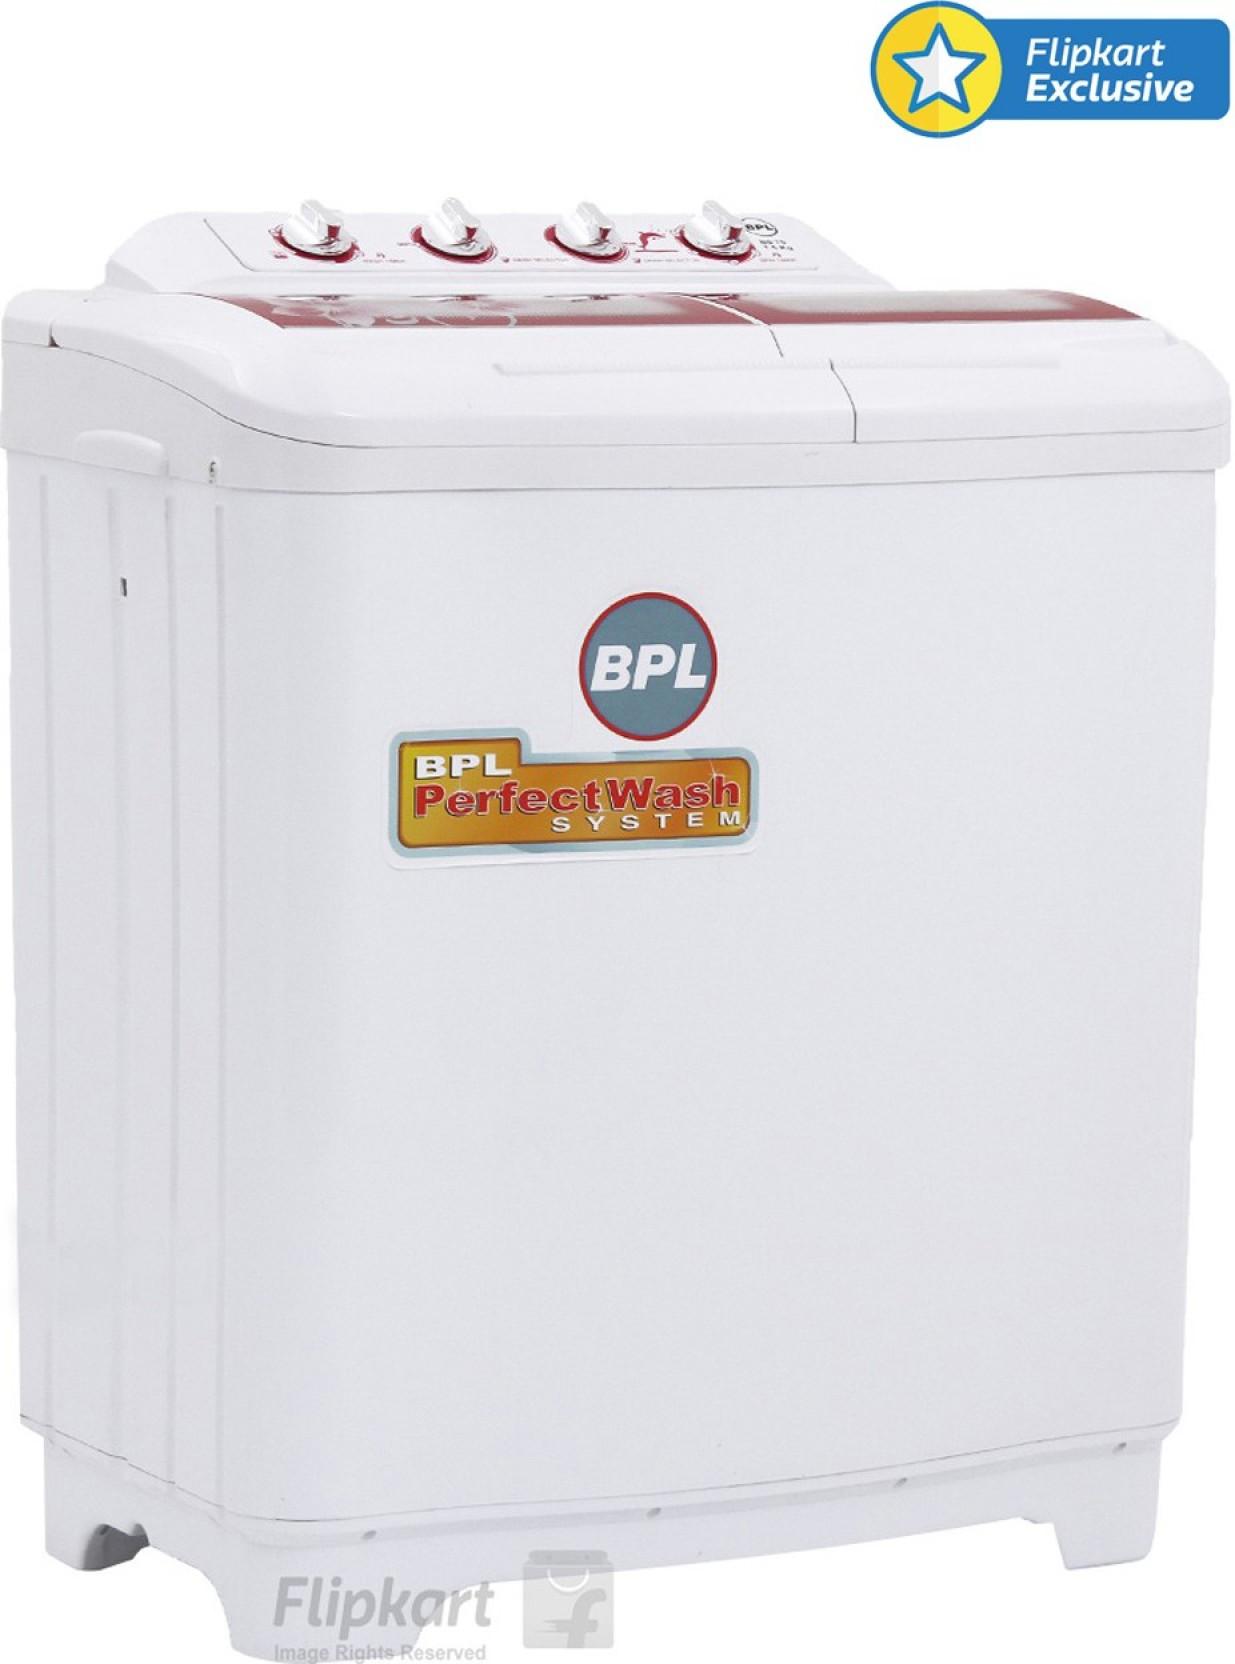 [CSDW_4250]   TL_4118] Bpl Washing Machine Wiring Diagram Schematic Wiring | Bpl Washing Machine Wiring Diagram |  | Hyedi Stre Sieg Hendil Mohammedshrine Librar Wiring 101